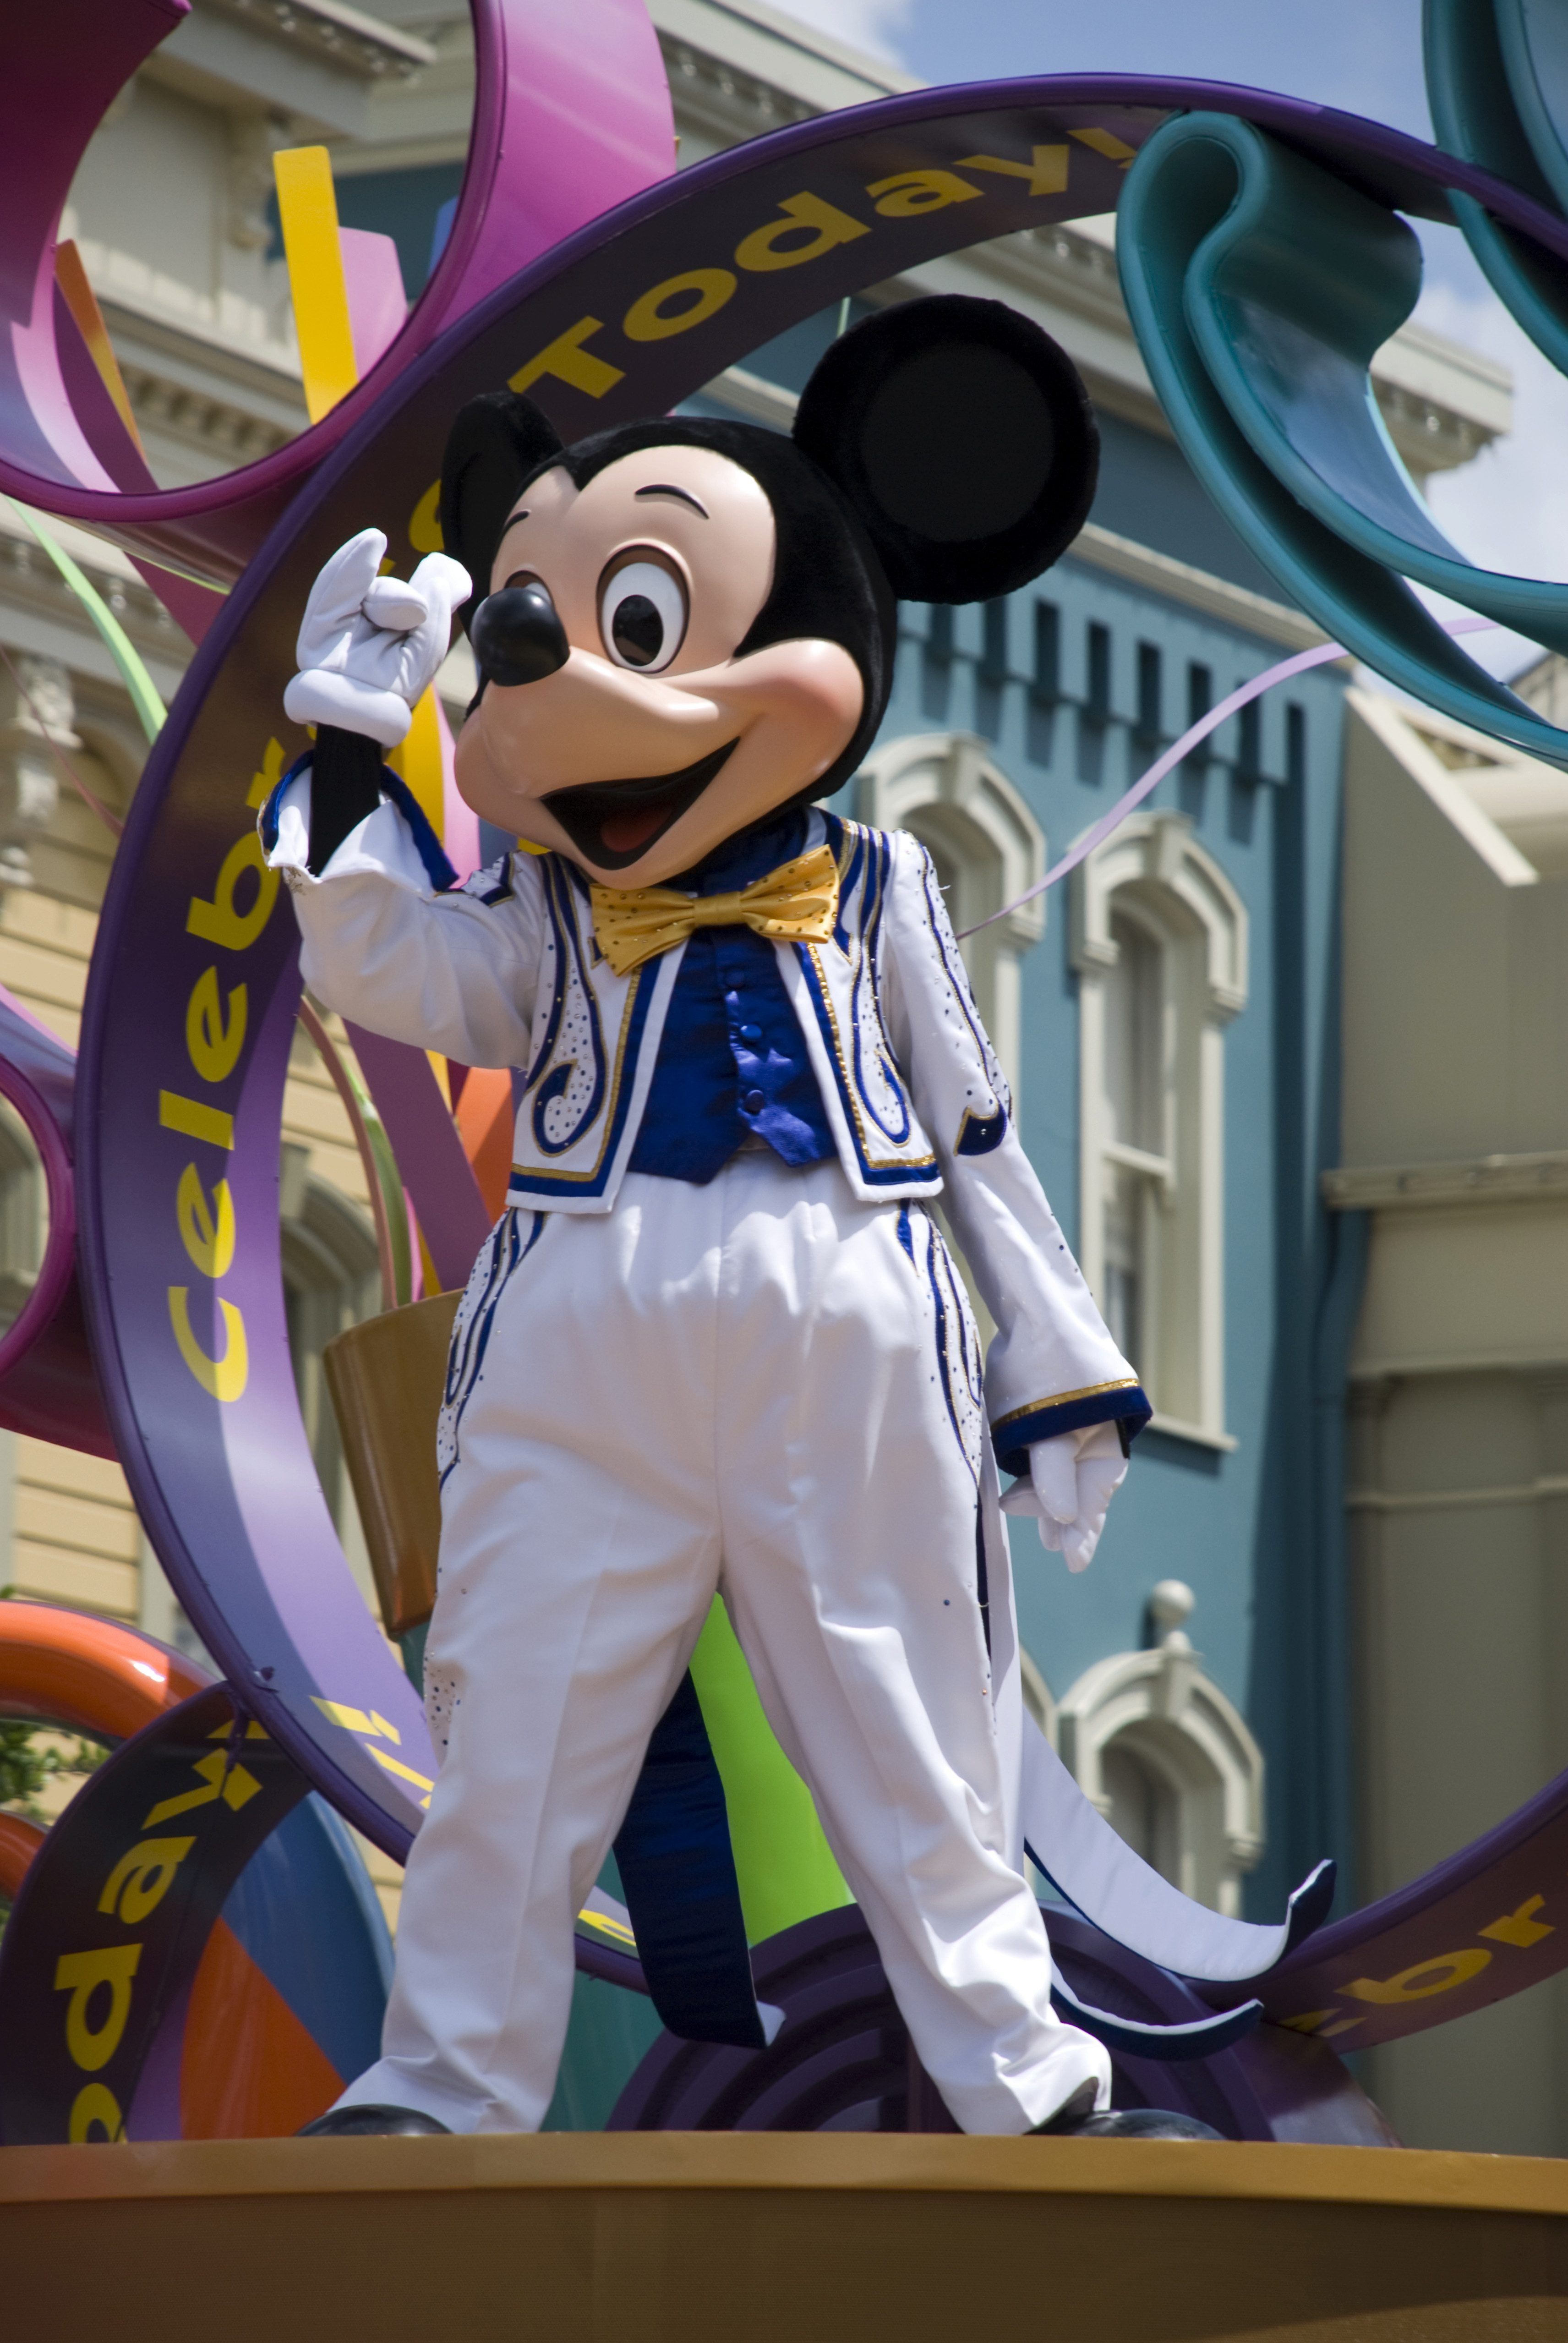 Mandatory Credit: Photo by imageBROKER/Shutterstock (1878150a) Walt Disney World Resort, Florida, USA VARIOUS